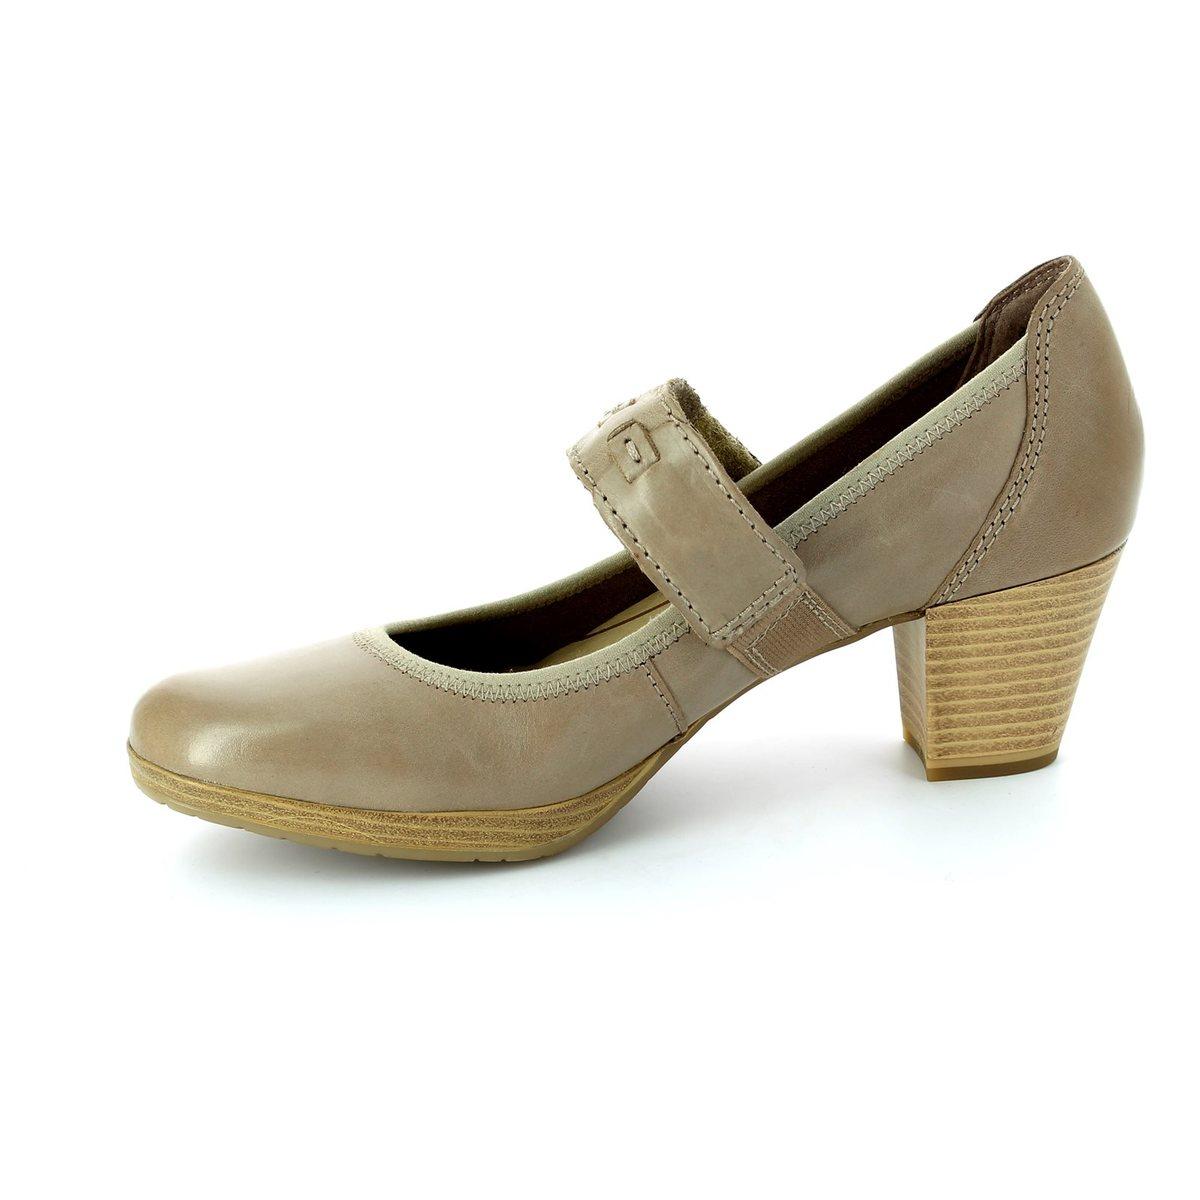 marco tozzi barsabar 24415 335 taupe heeled shoes. Black Bedroom Furniture Sets. Home Design Ideas